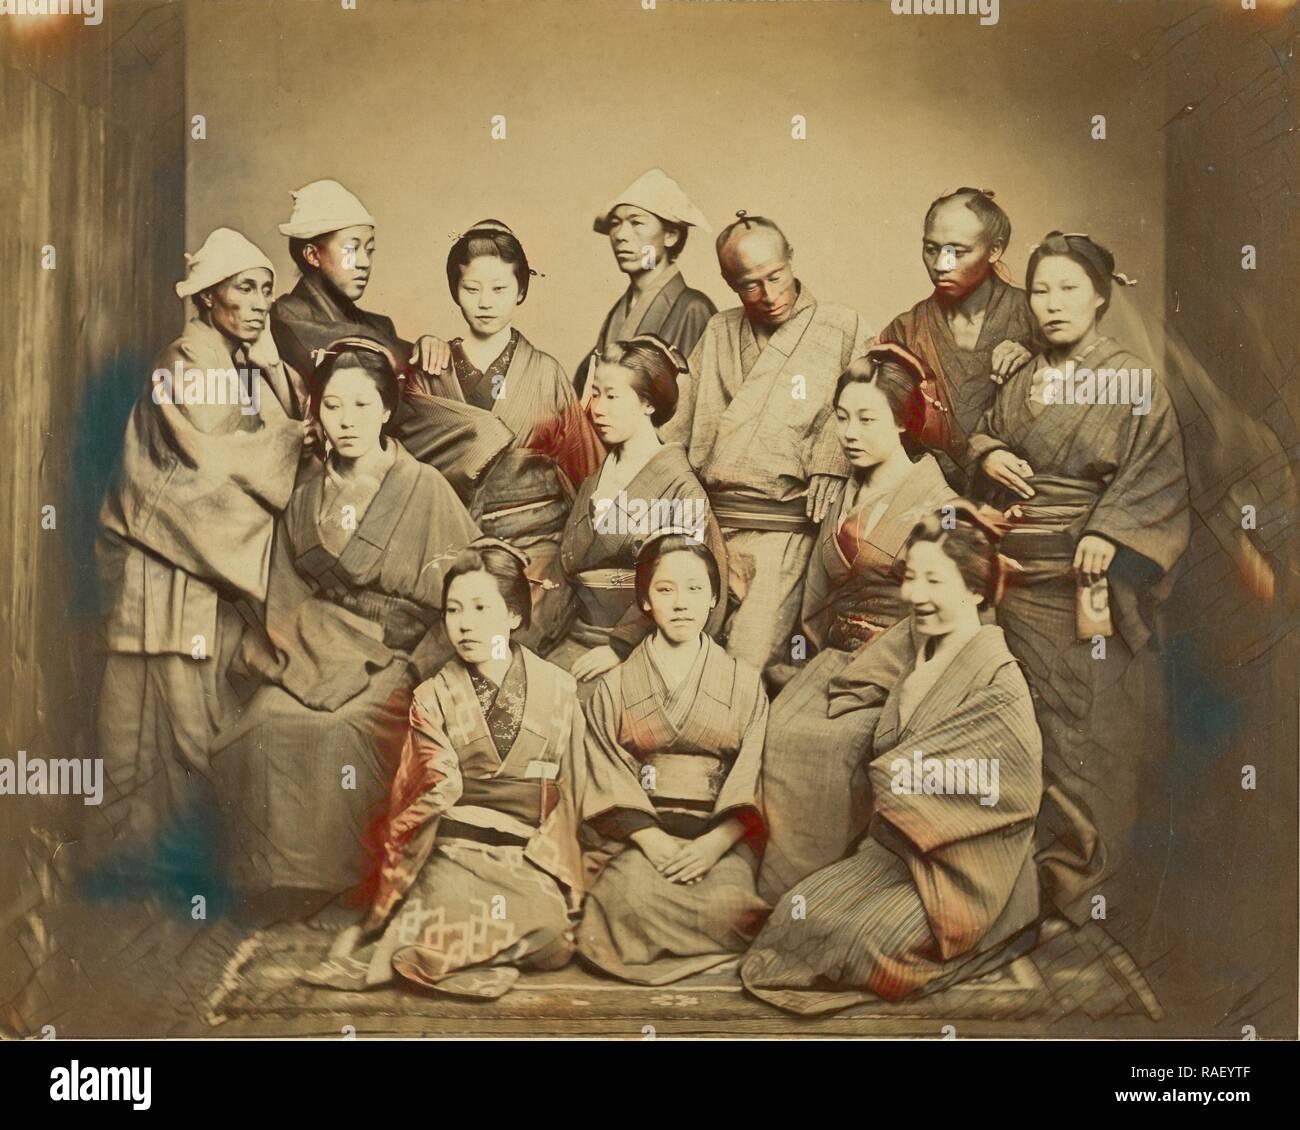 Japanese Family, Felice Beato (English, born Italy, 1832 - 1909), about 1862, Albumen silver print. Reimagined Stock Photo